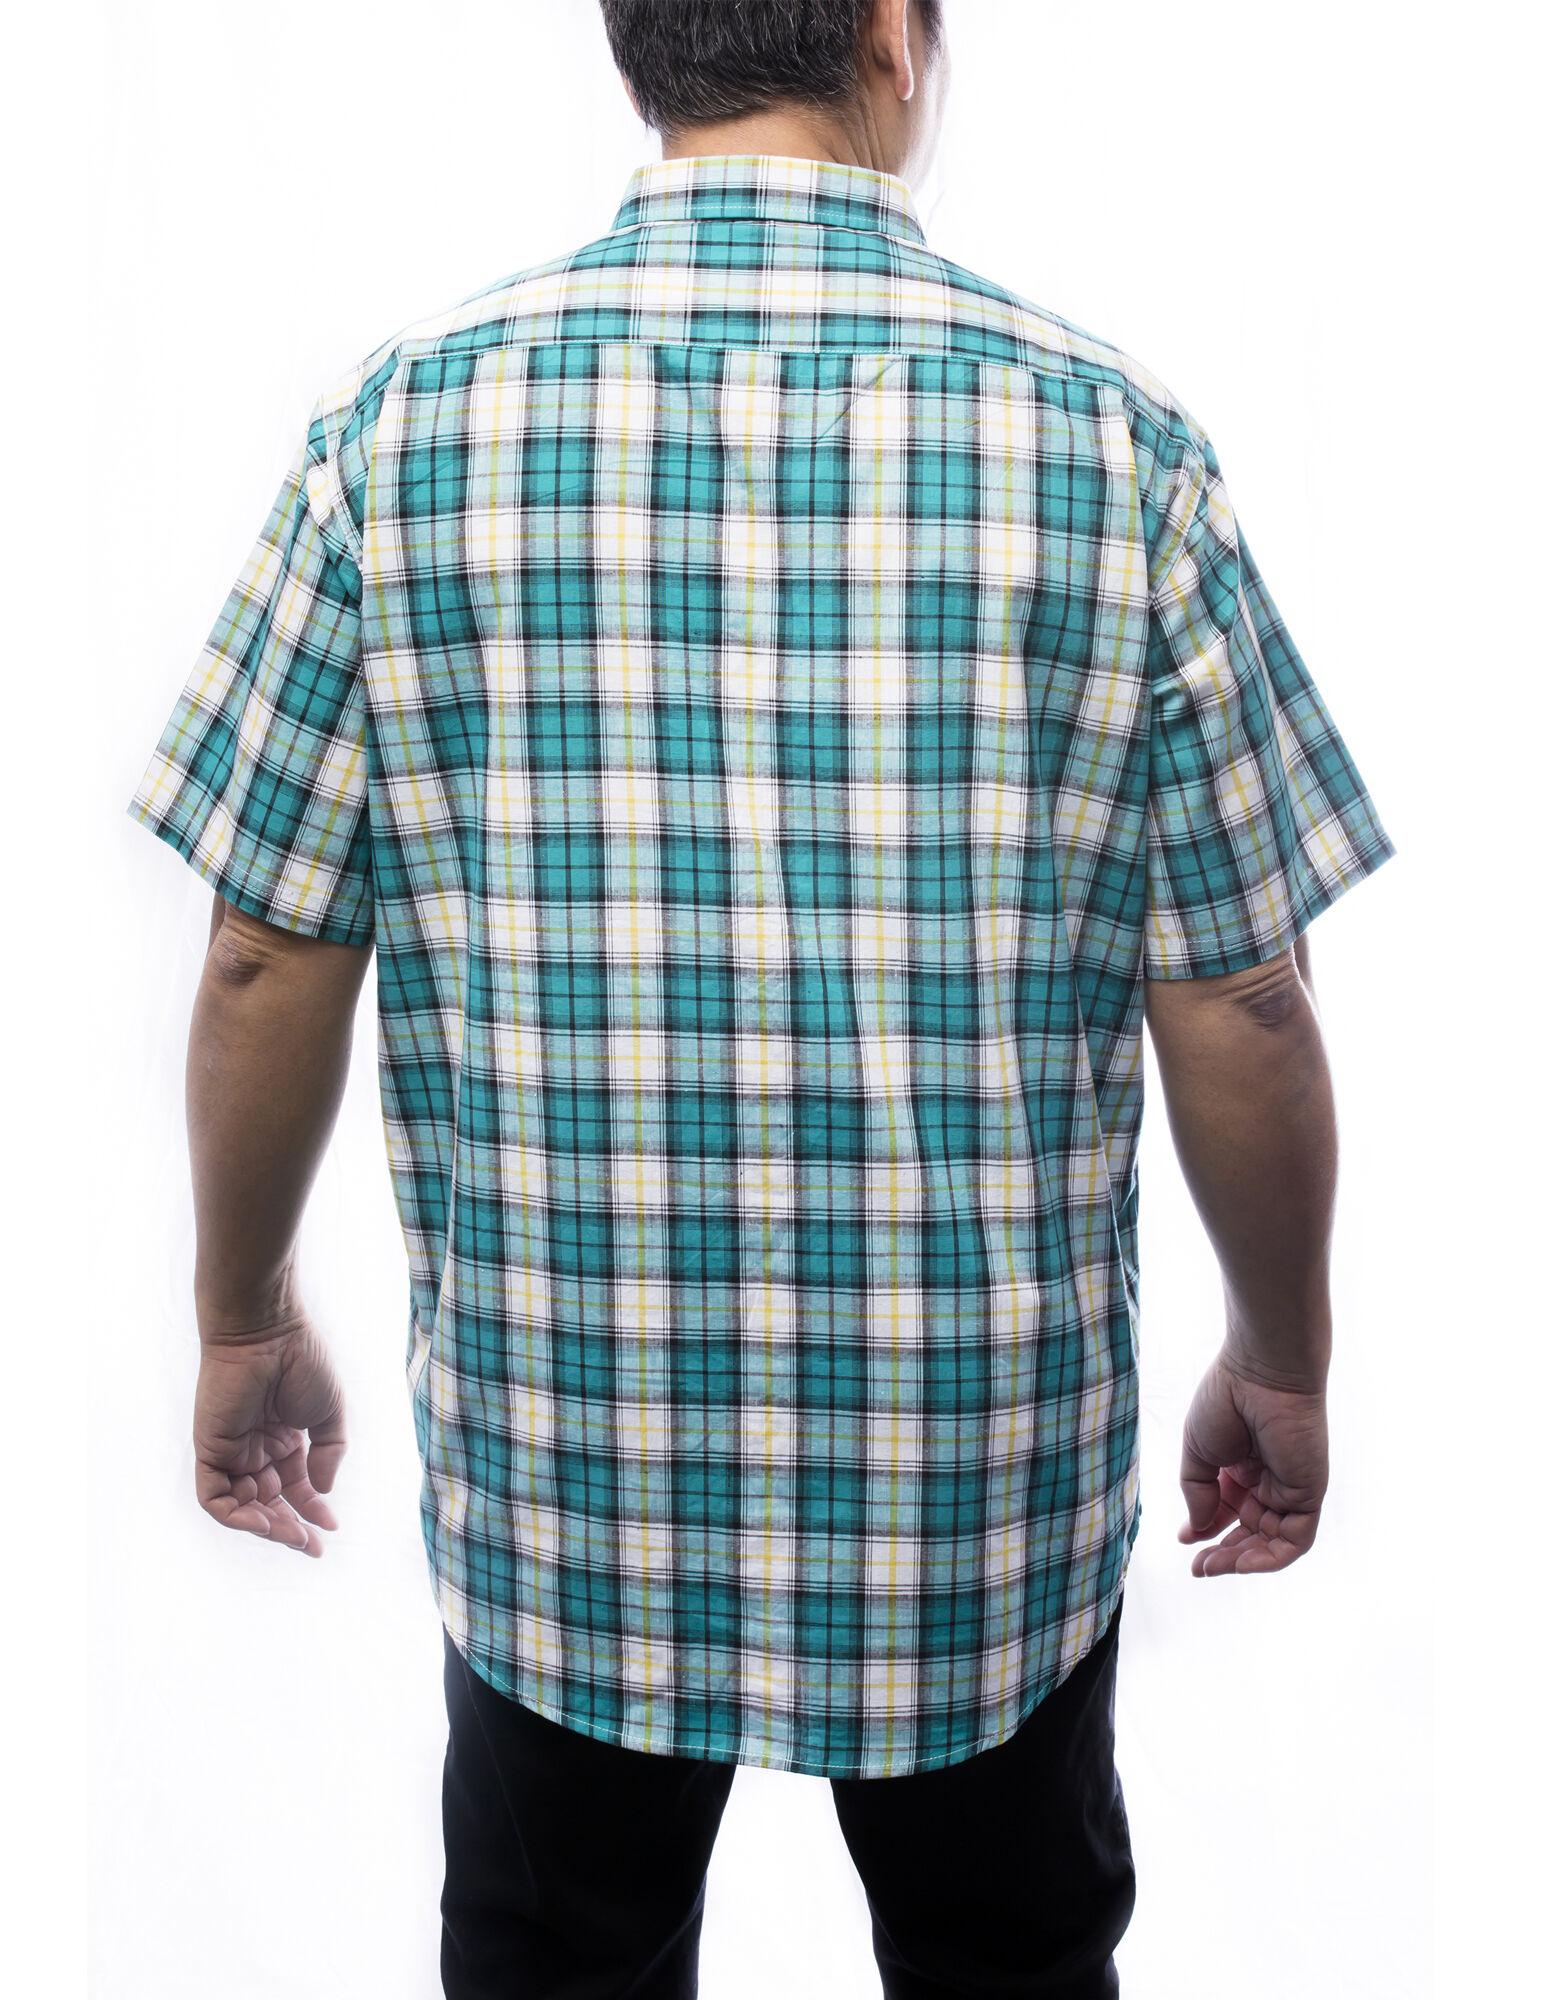 Men 39 s short sleeves plaid shirt dickies canada for Dickies short sleeve plaid shirt